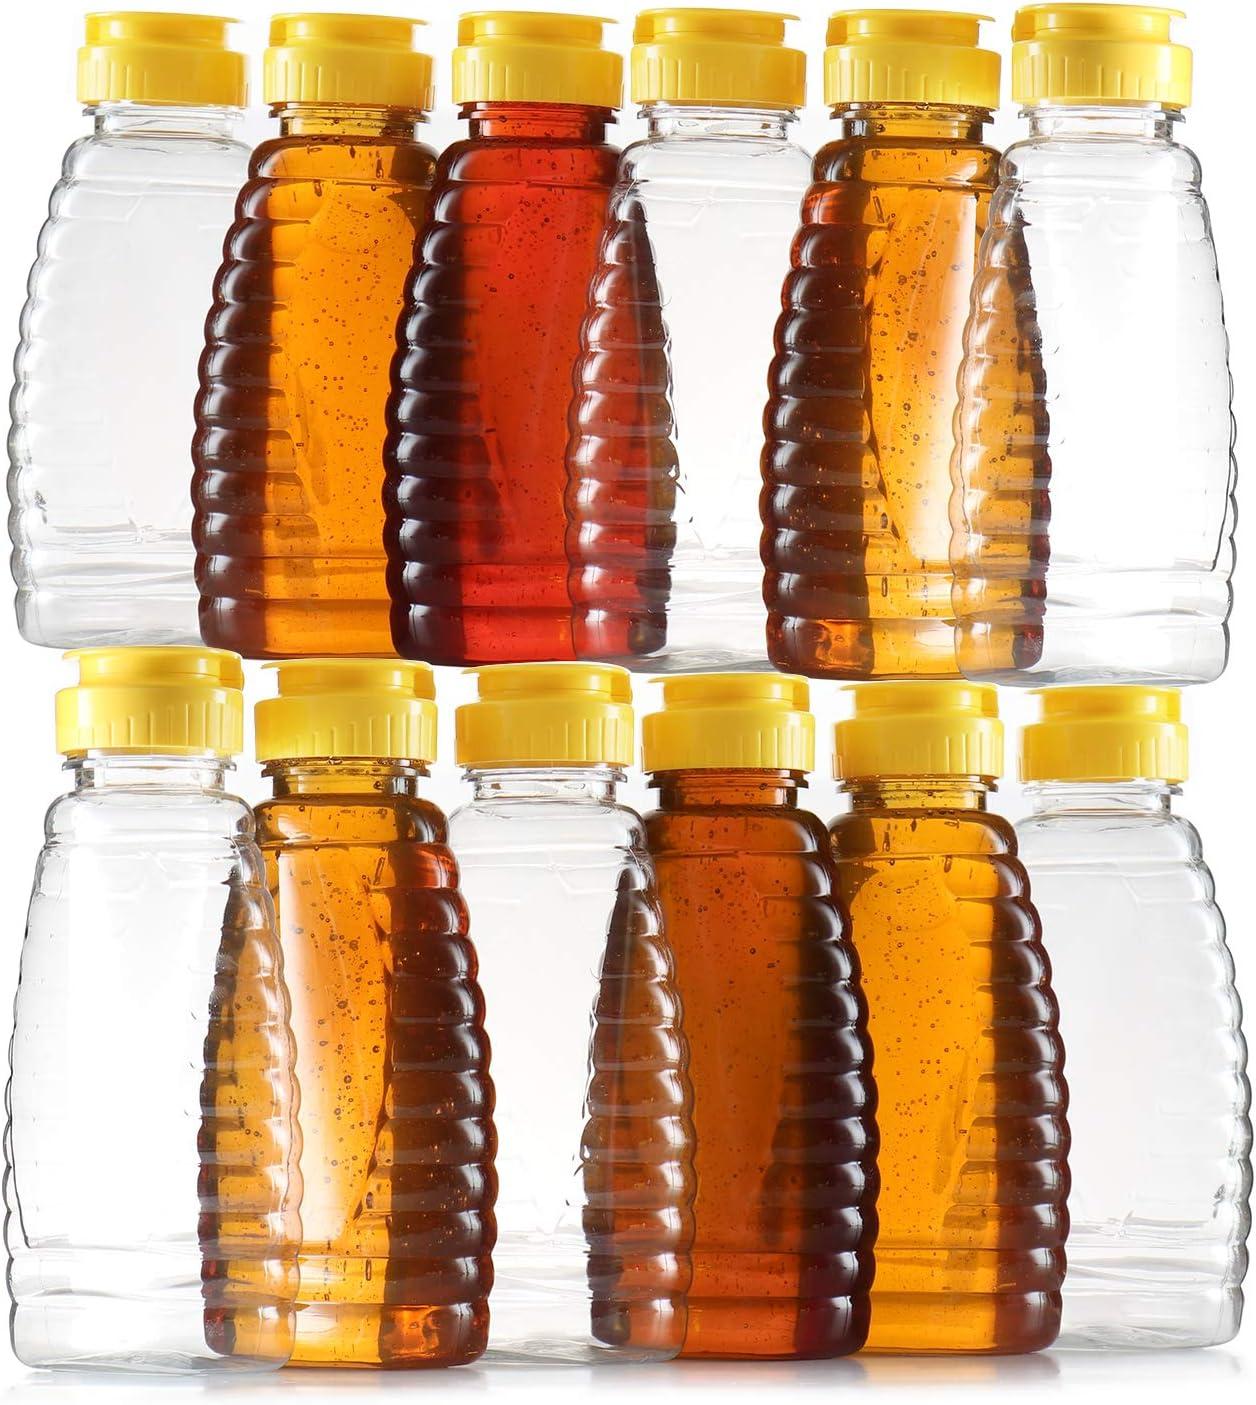 Empty Plastic Honey Bottles – Clear Plastic Honey Jars - PET Food Grade Plastic Honey Container Refill – Squeeze Honey Bottle With Leak Proof Flip-Top Caps For Easy Dispensing - BPA Free Food Safe